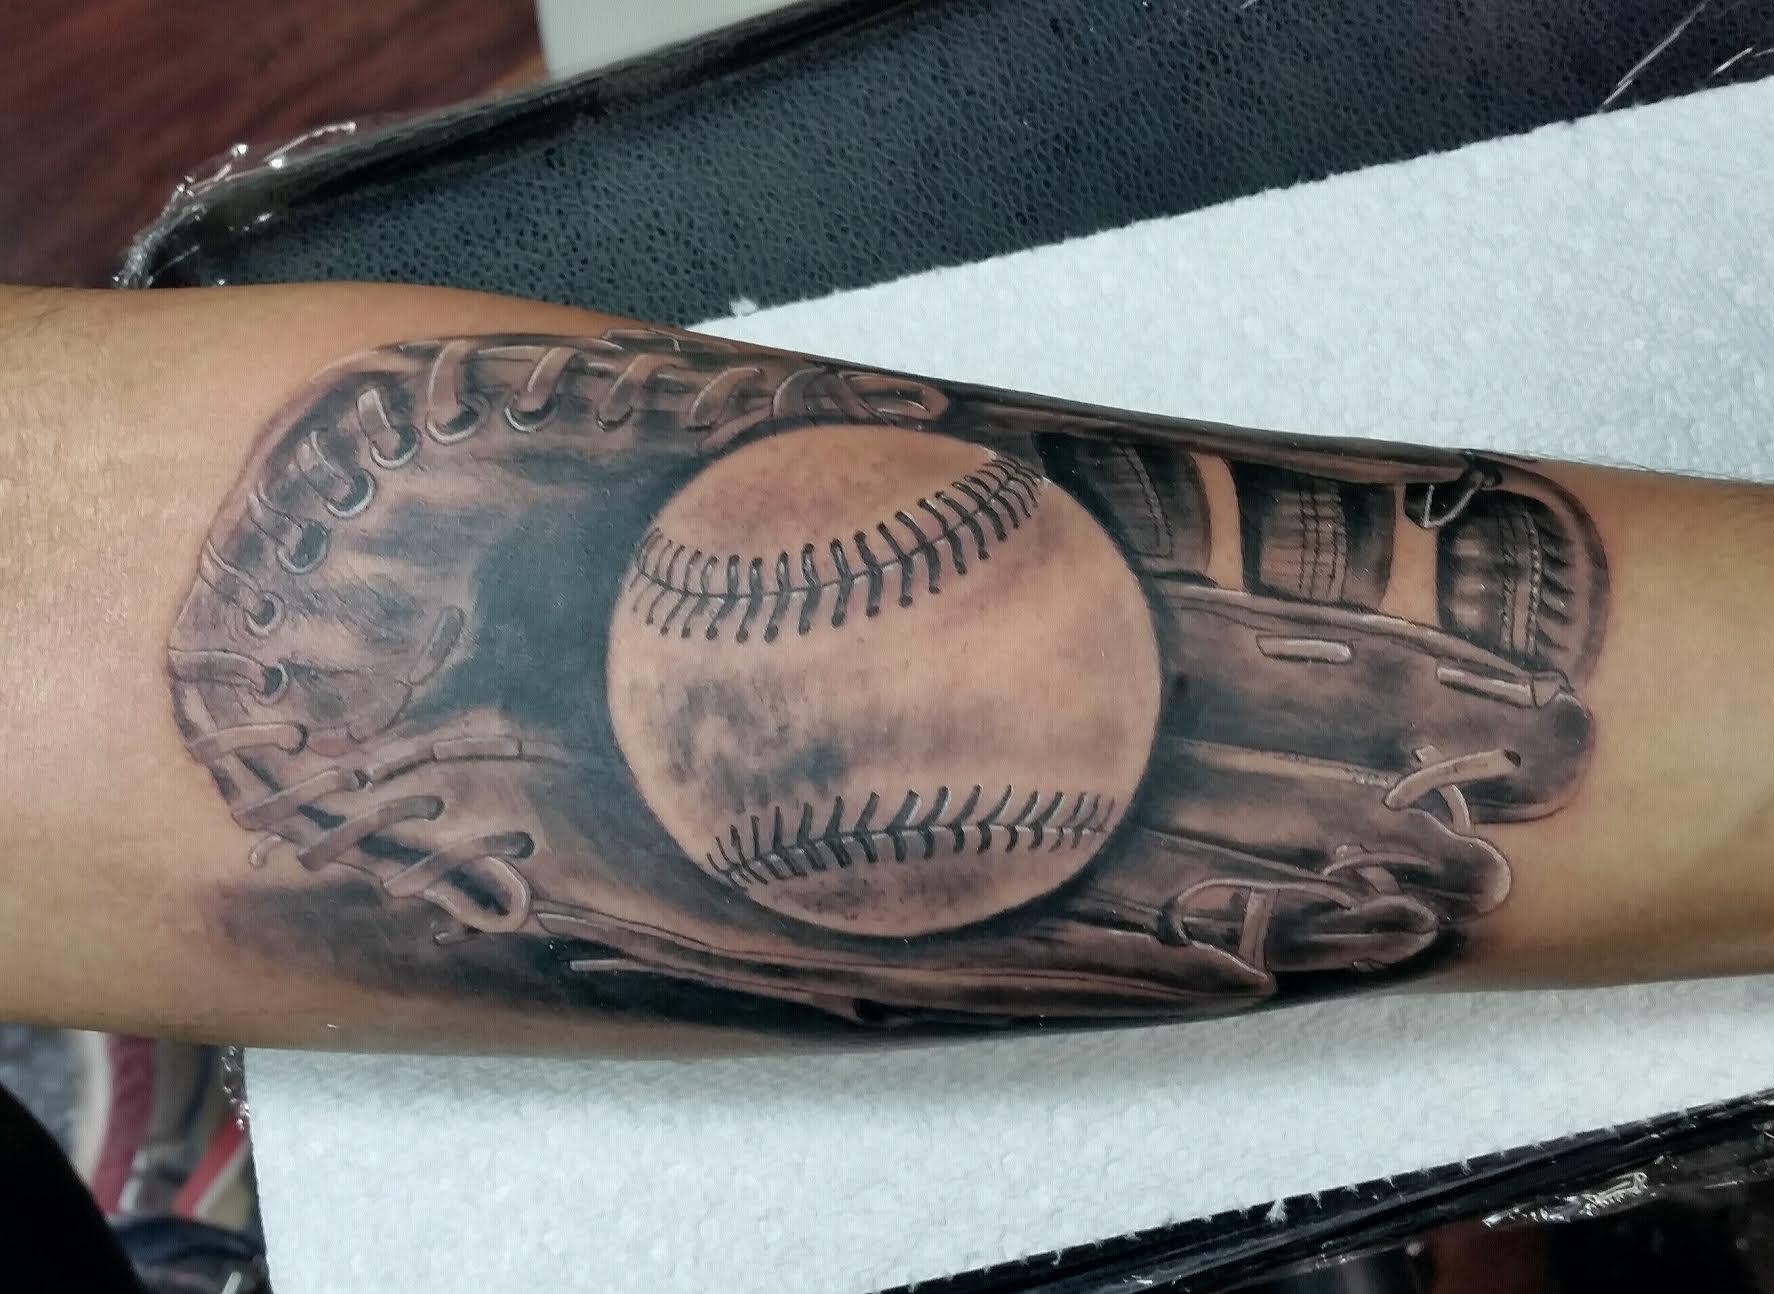 Baseball with glove